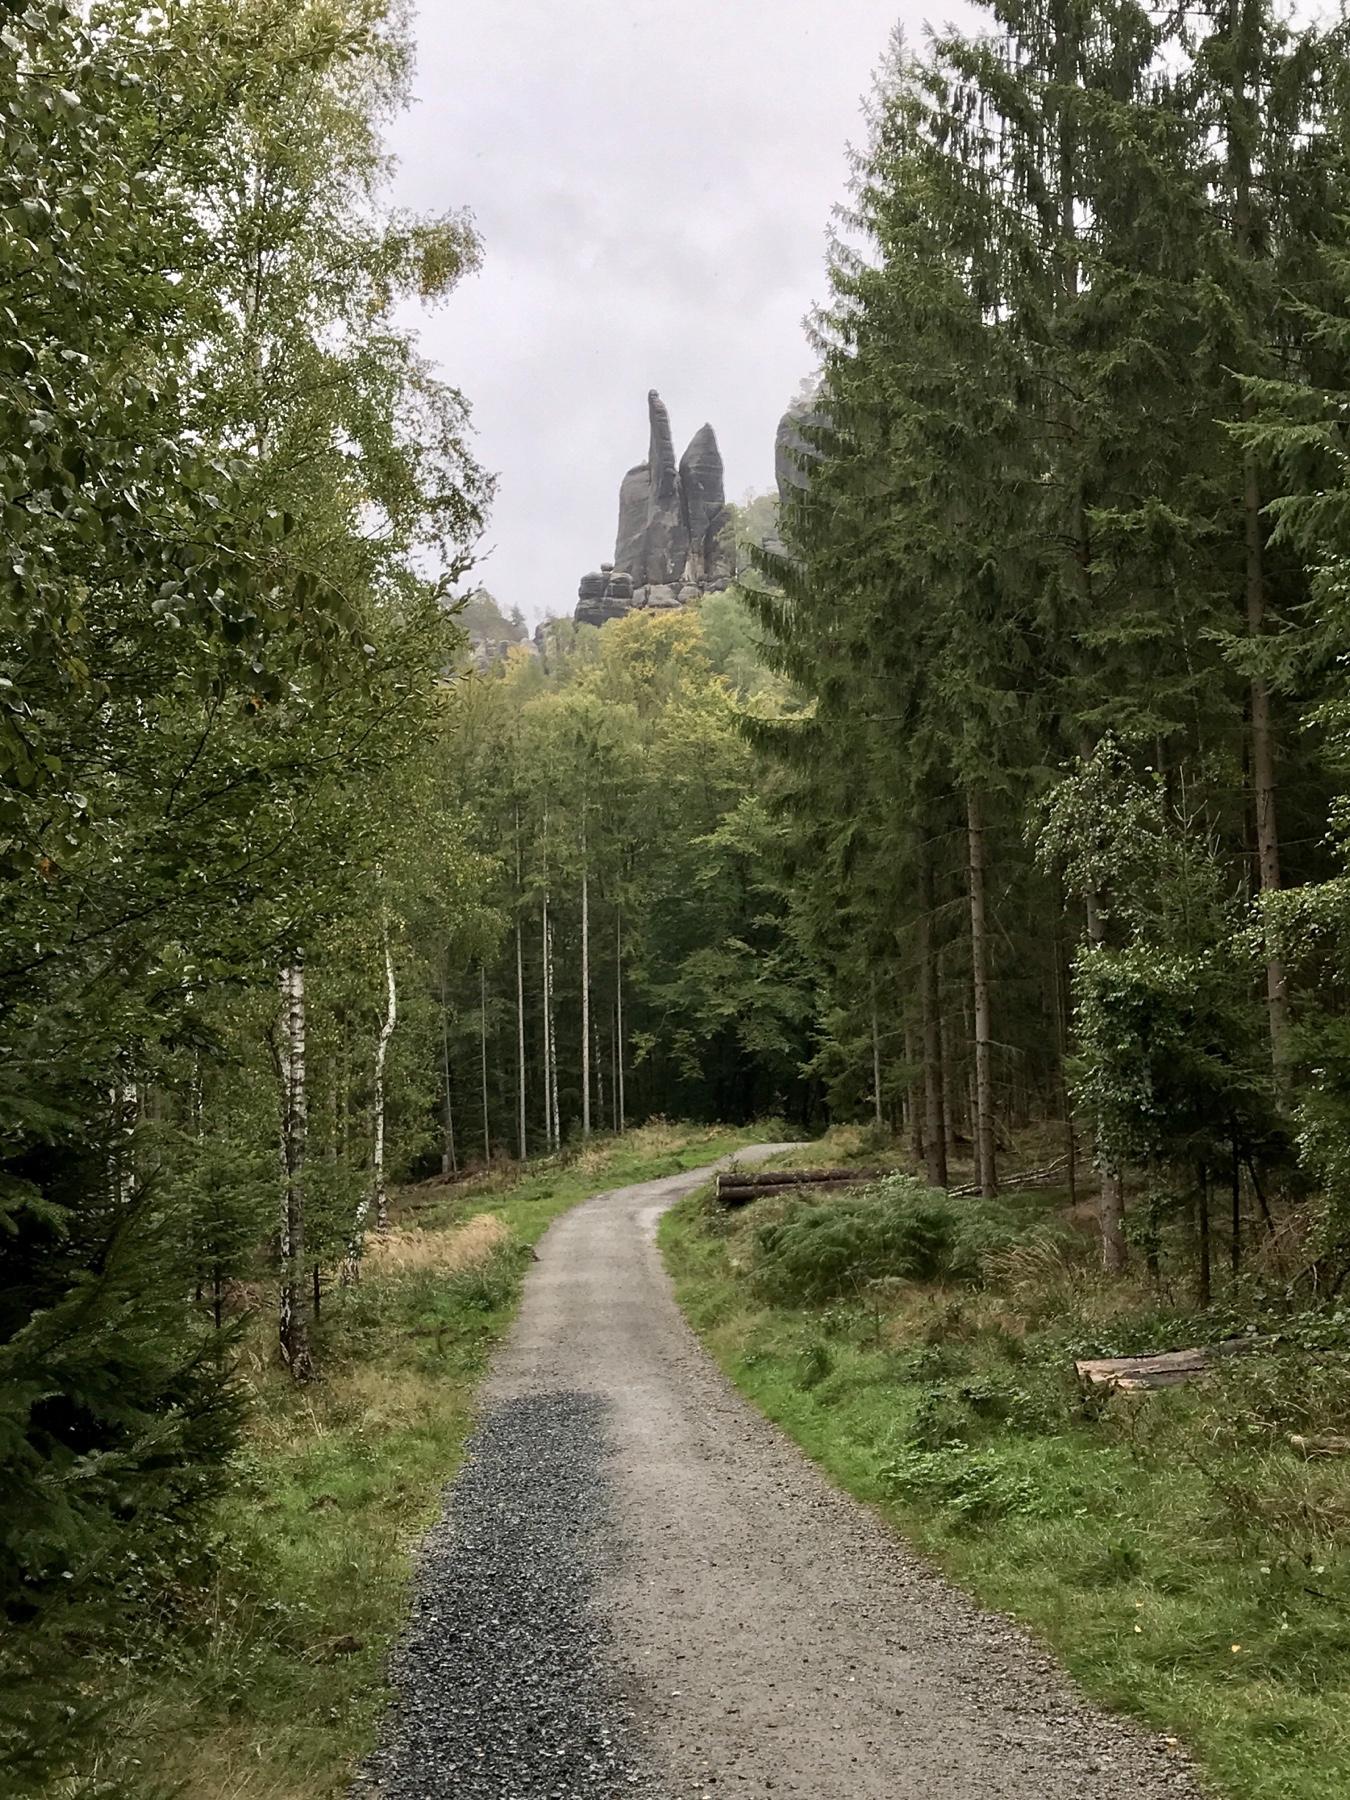 Brosinnadel, Malerweg Etappe 4, Altendorf Neumannmühle